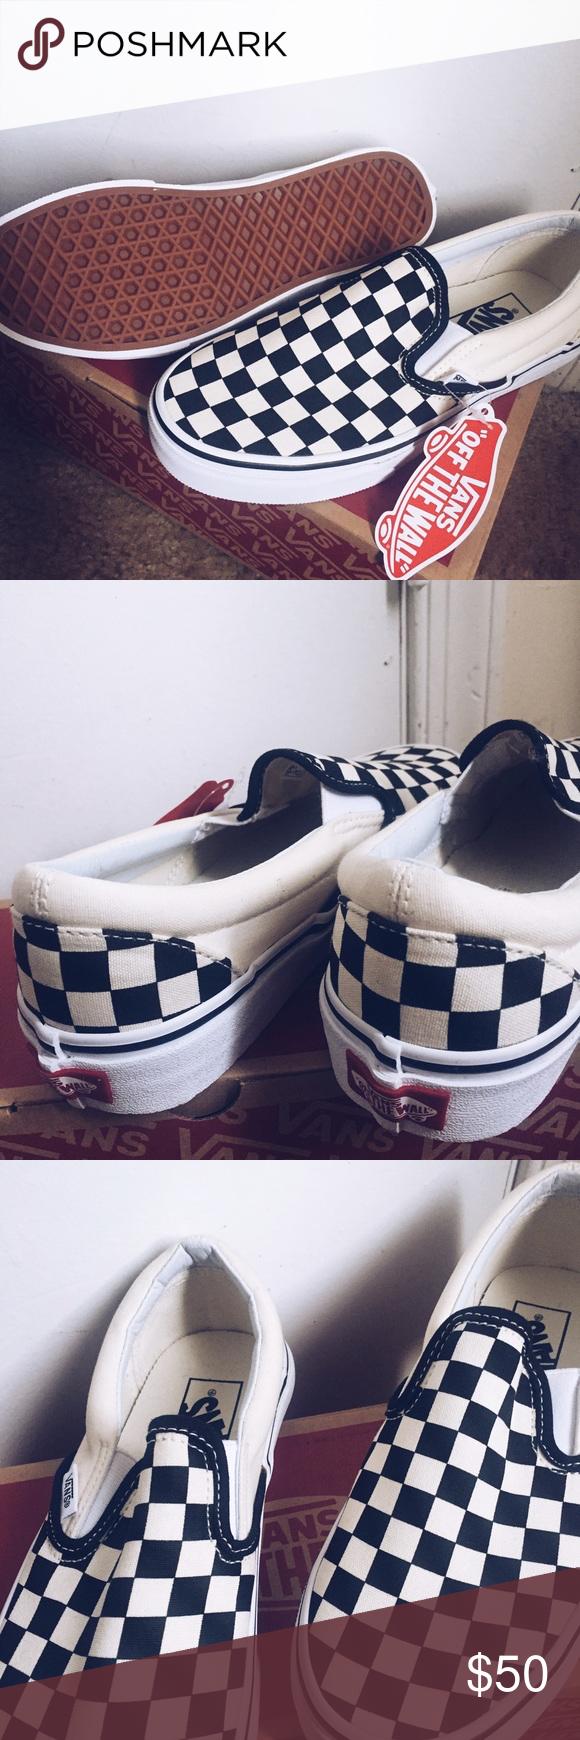 0270080188 Mens checkered vans New! never work size 5.5 for men Vans Shoes Sneakers